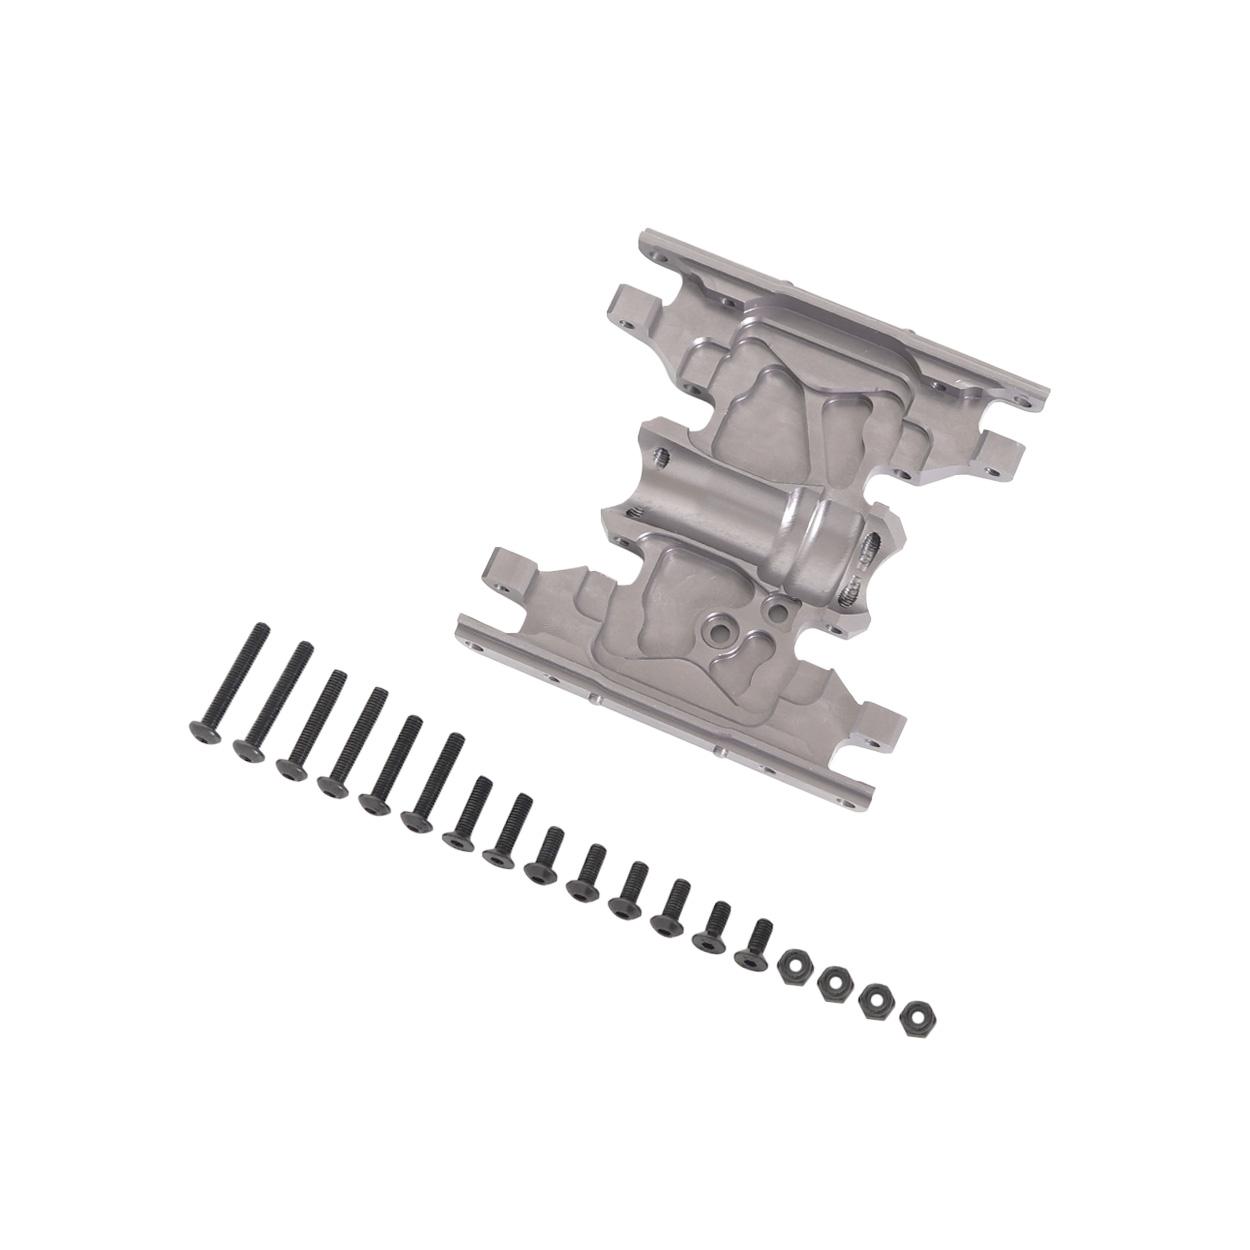 1/10 CNC Alloy Gear Box Mount Holder for 1/10 Rc Crawlers Axial SCX10 D90 D110 Titanium